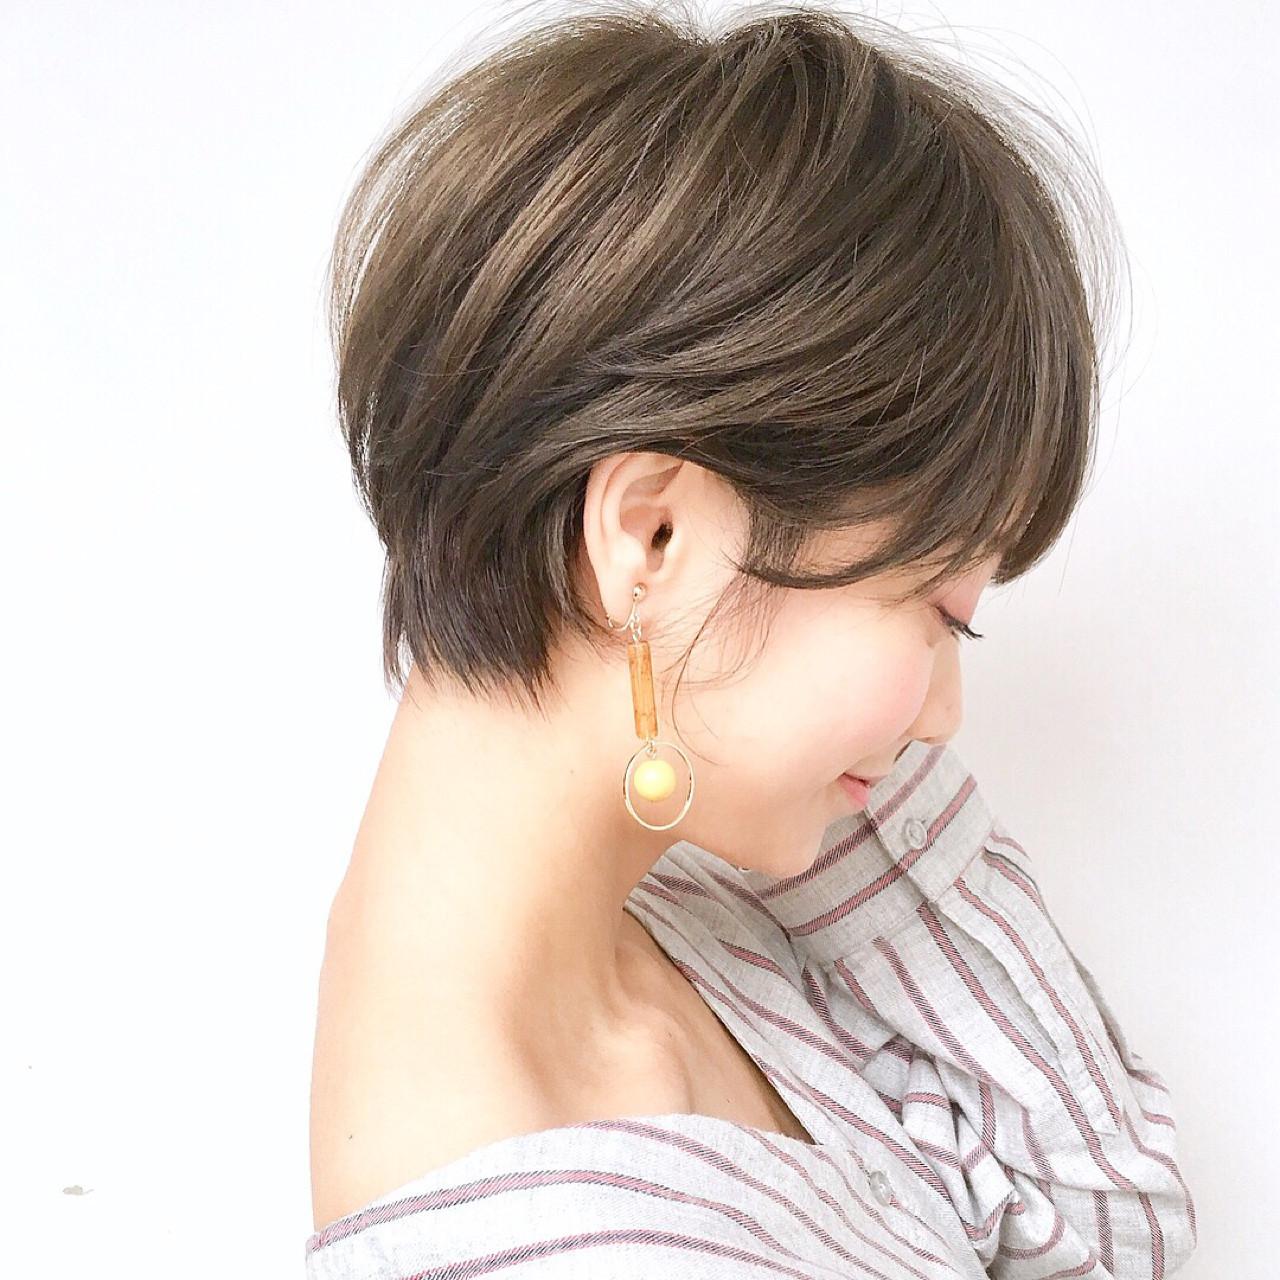 吉瀬美智子の画像 p1_13